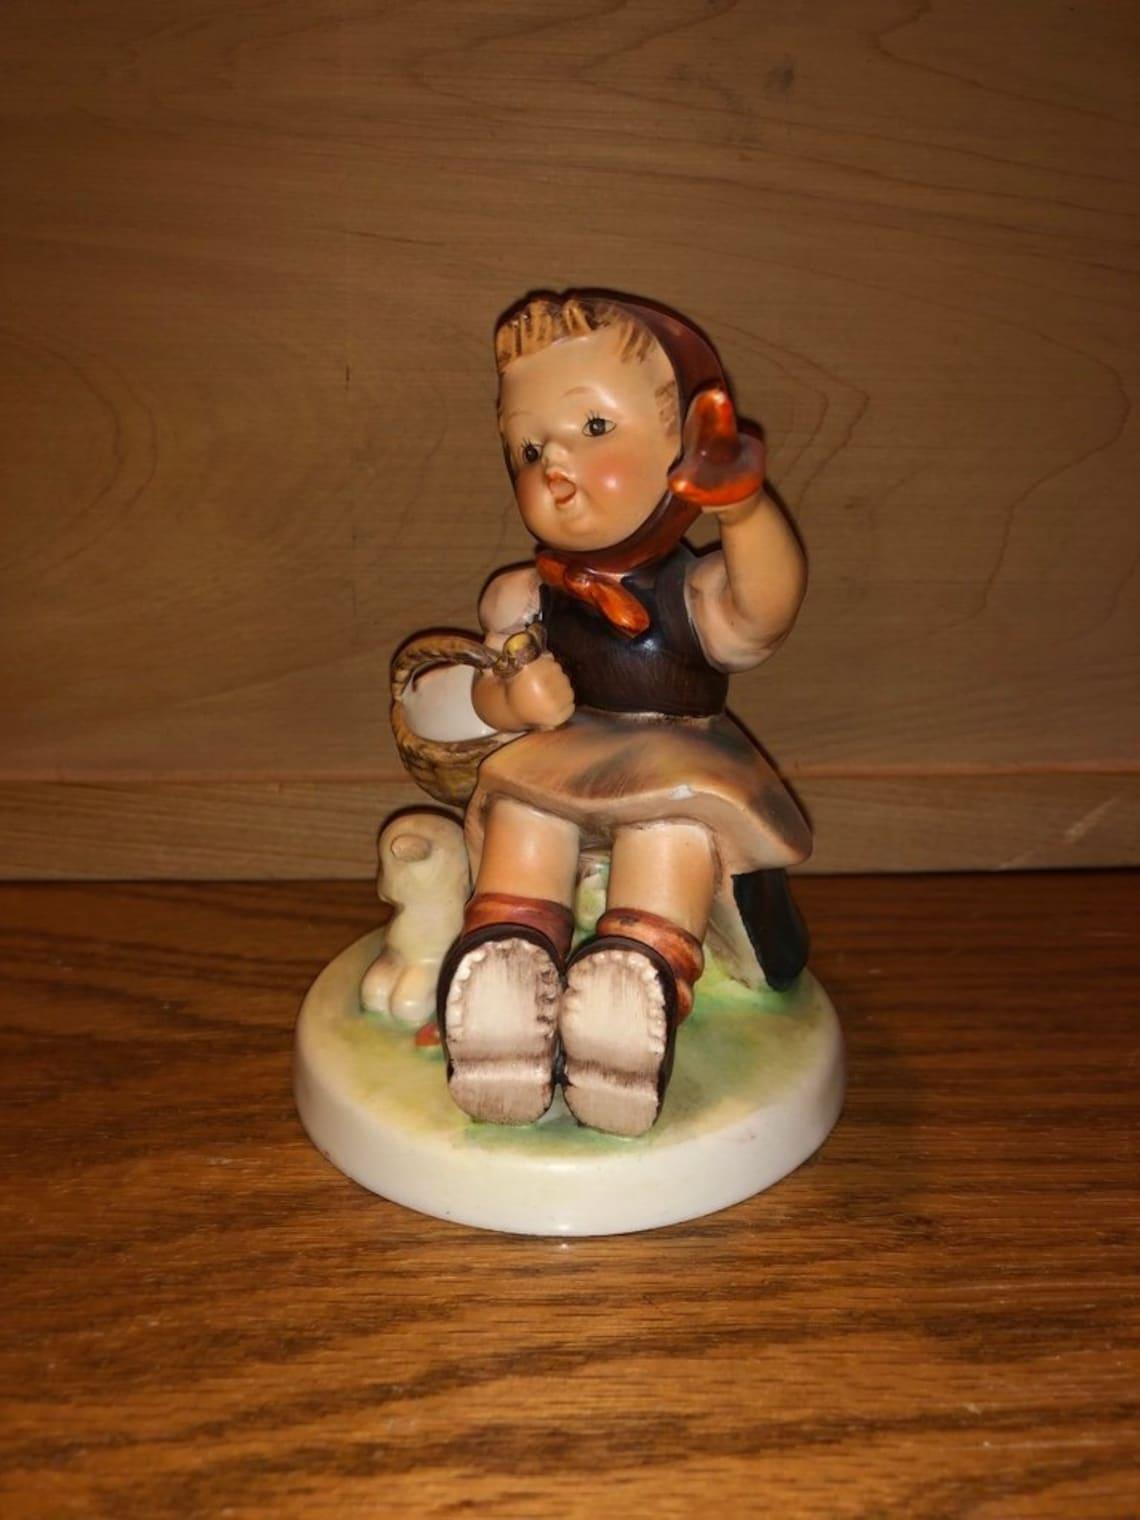 1937 Farewell Hummel figurine